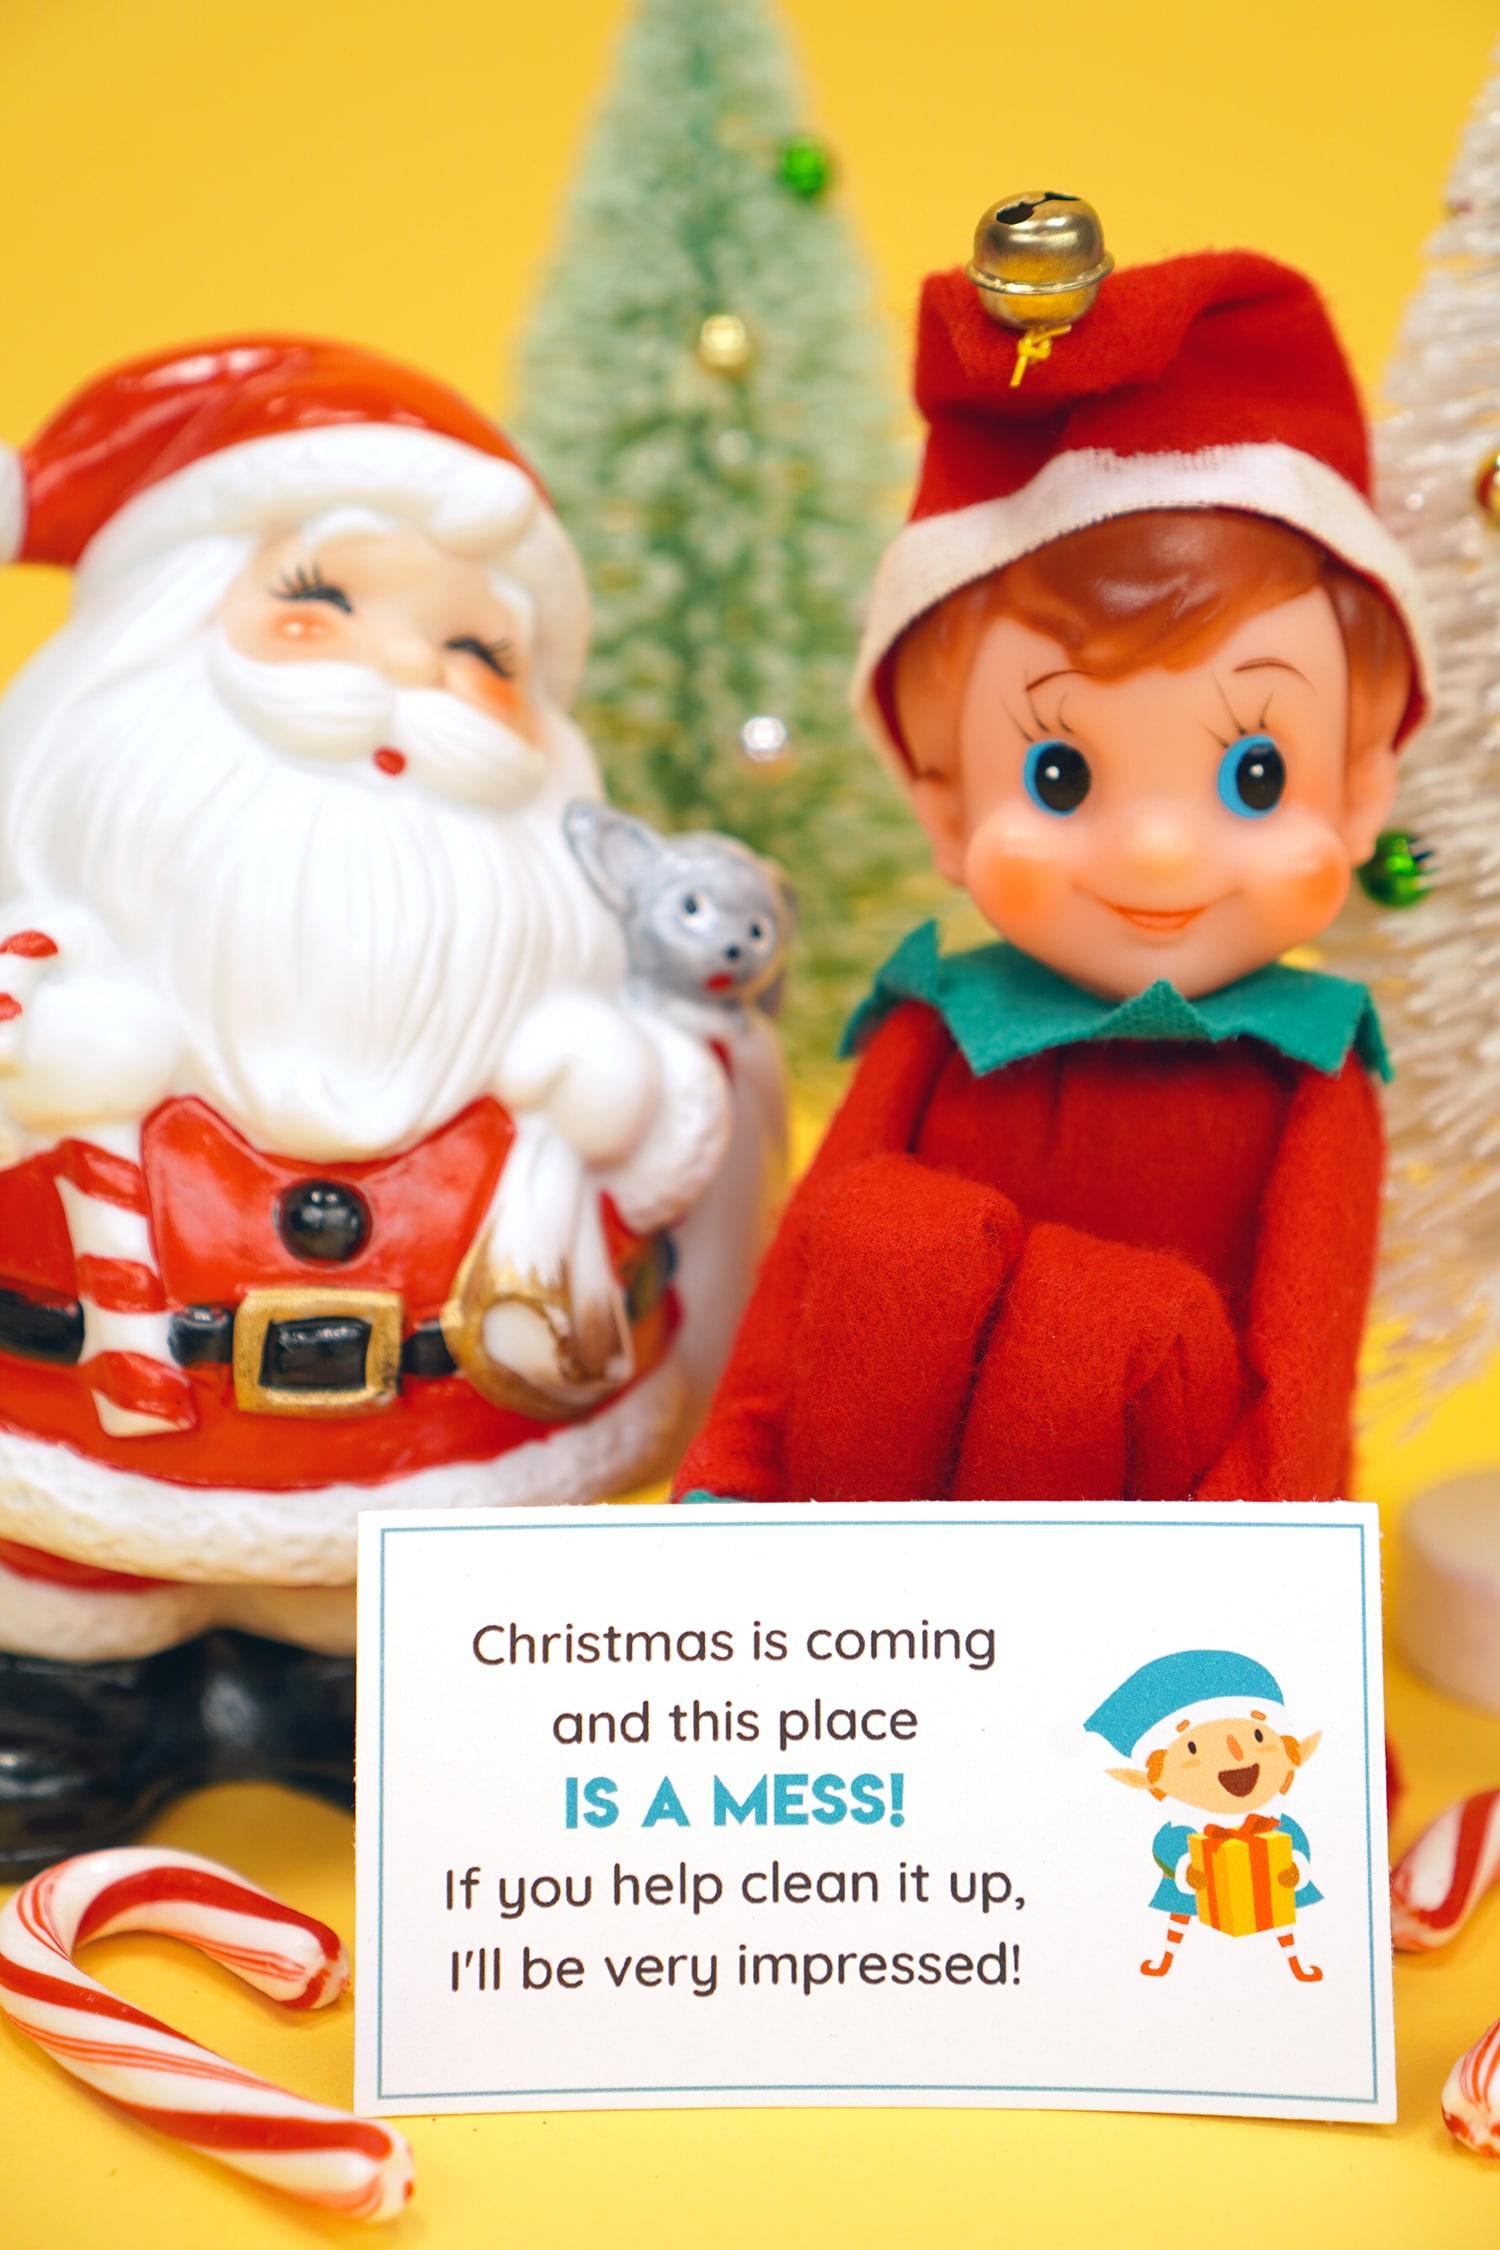 Vintage Elf doll with Elf on the Shelf printable note card, vintage ceramic Santa figurine, candy canes, and vintage sisal trees